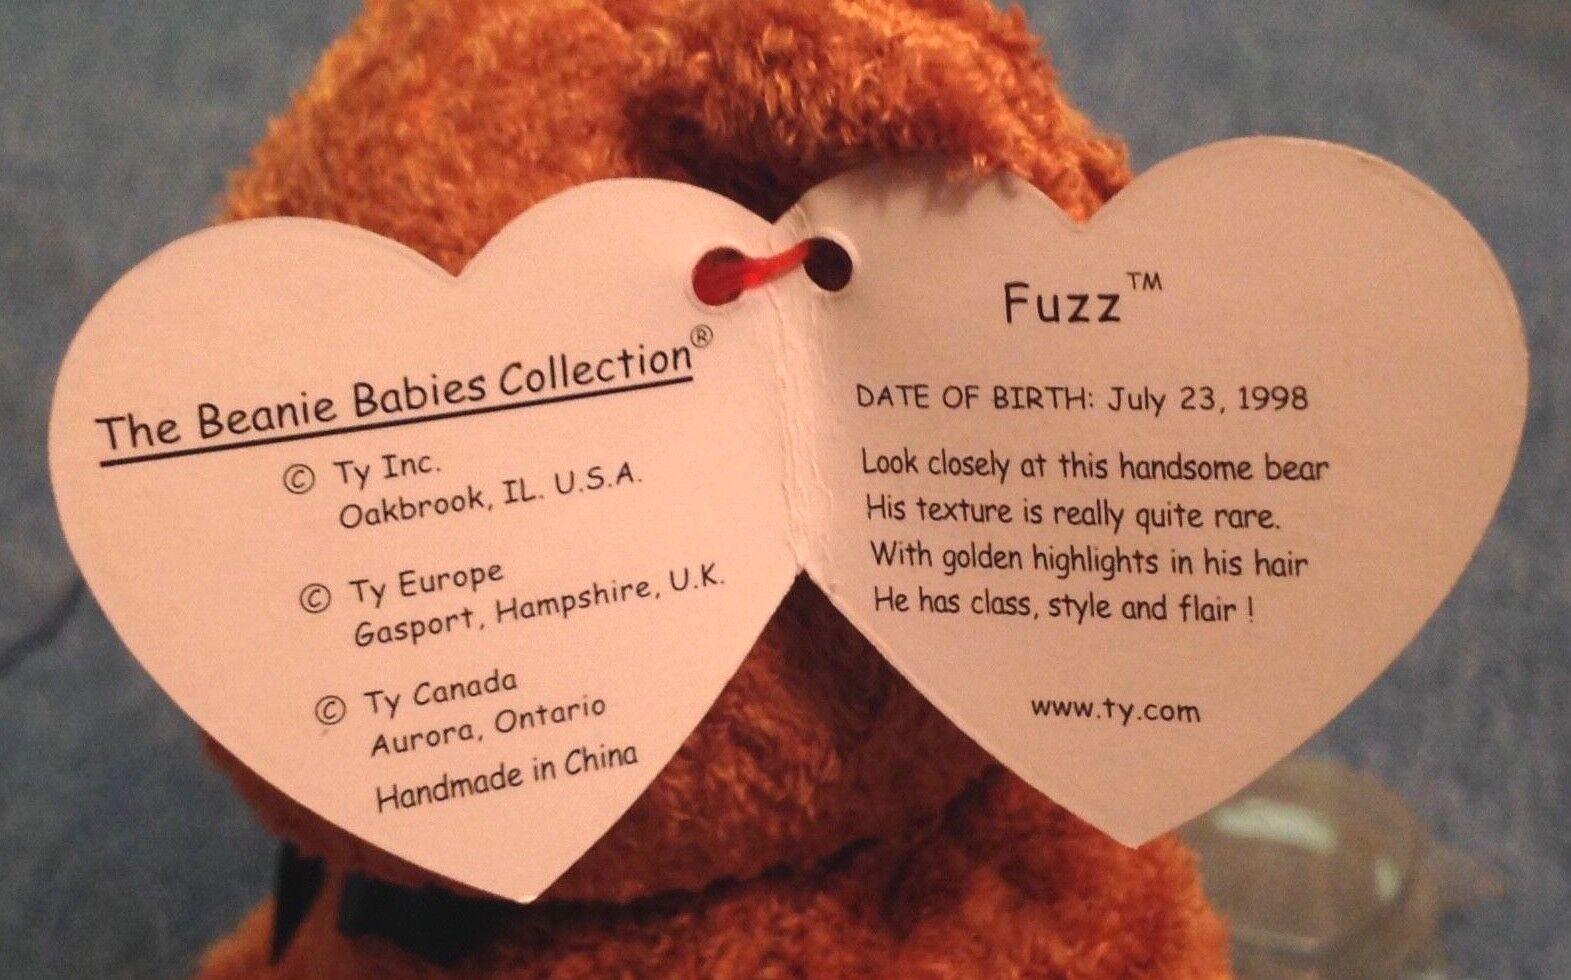 SET OF 2 2 2 TY SUPER SOFT MINT BEANIE BEARS = (1998) FUZZ & (2000) MELLOW -SEE PICS 30ebd8